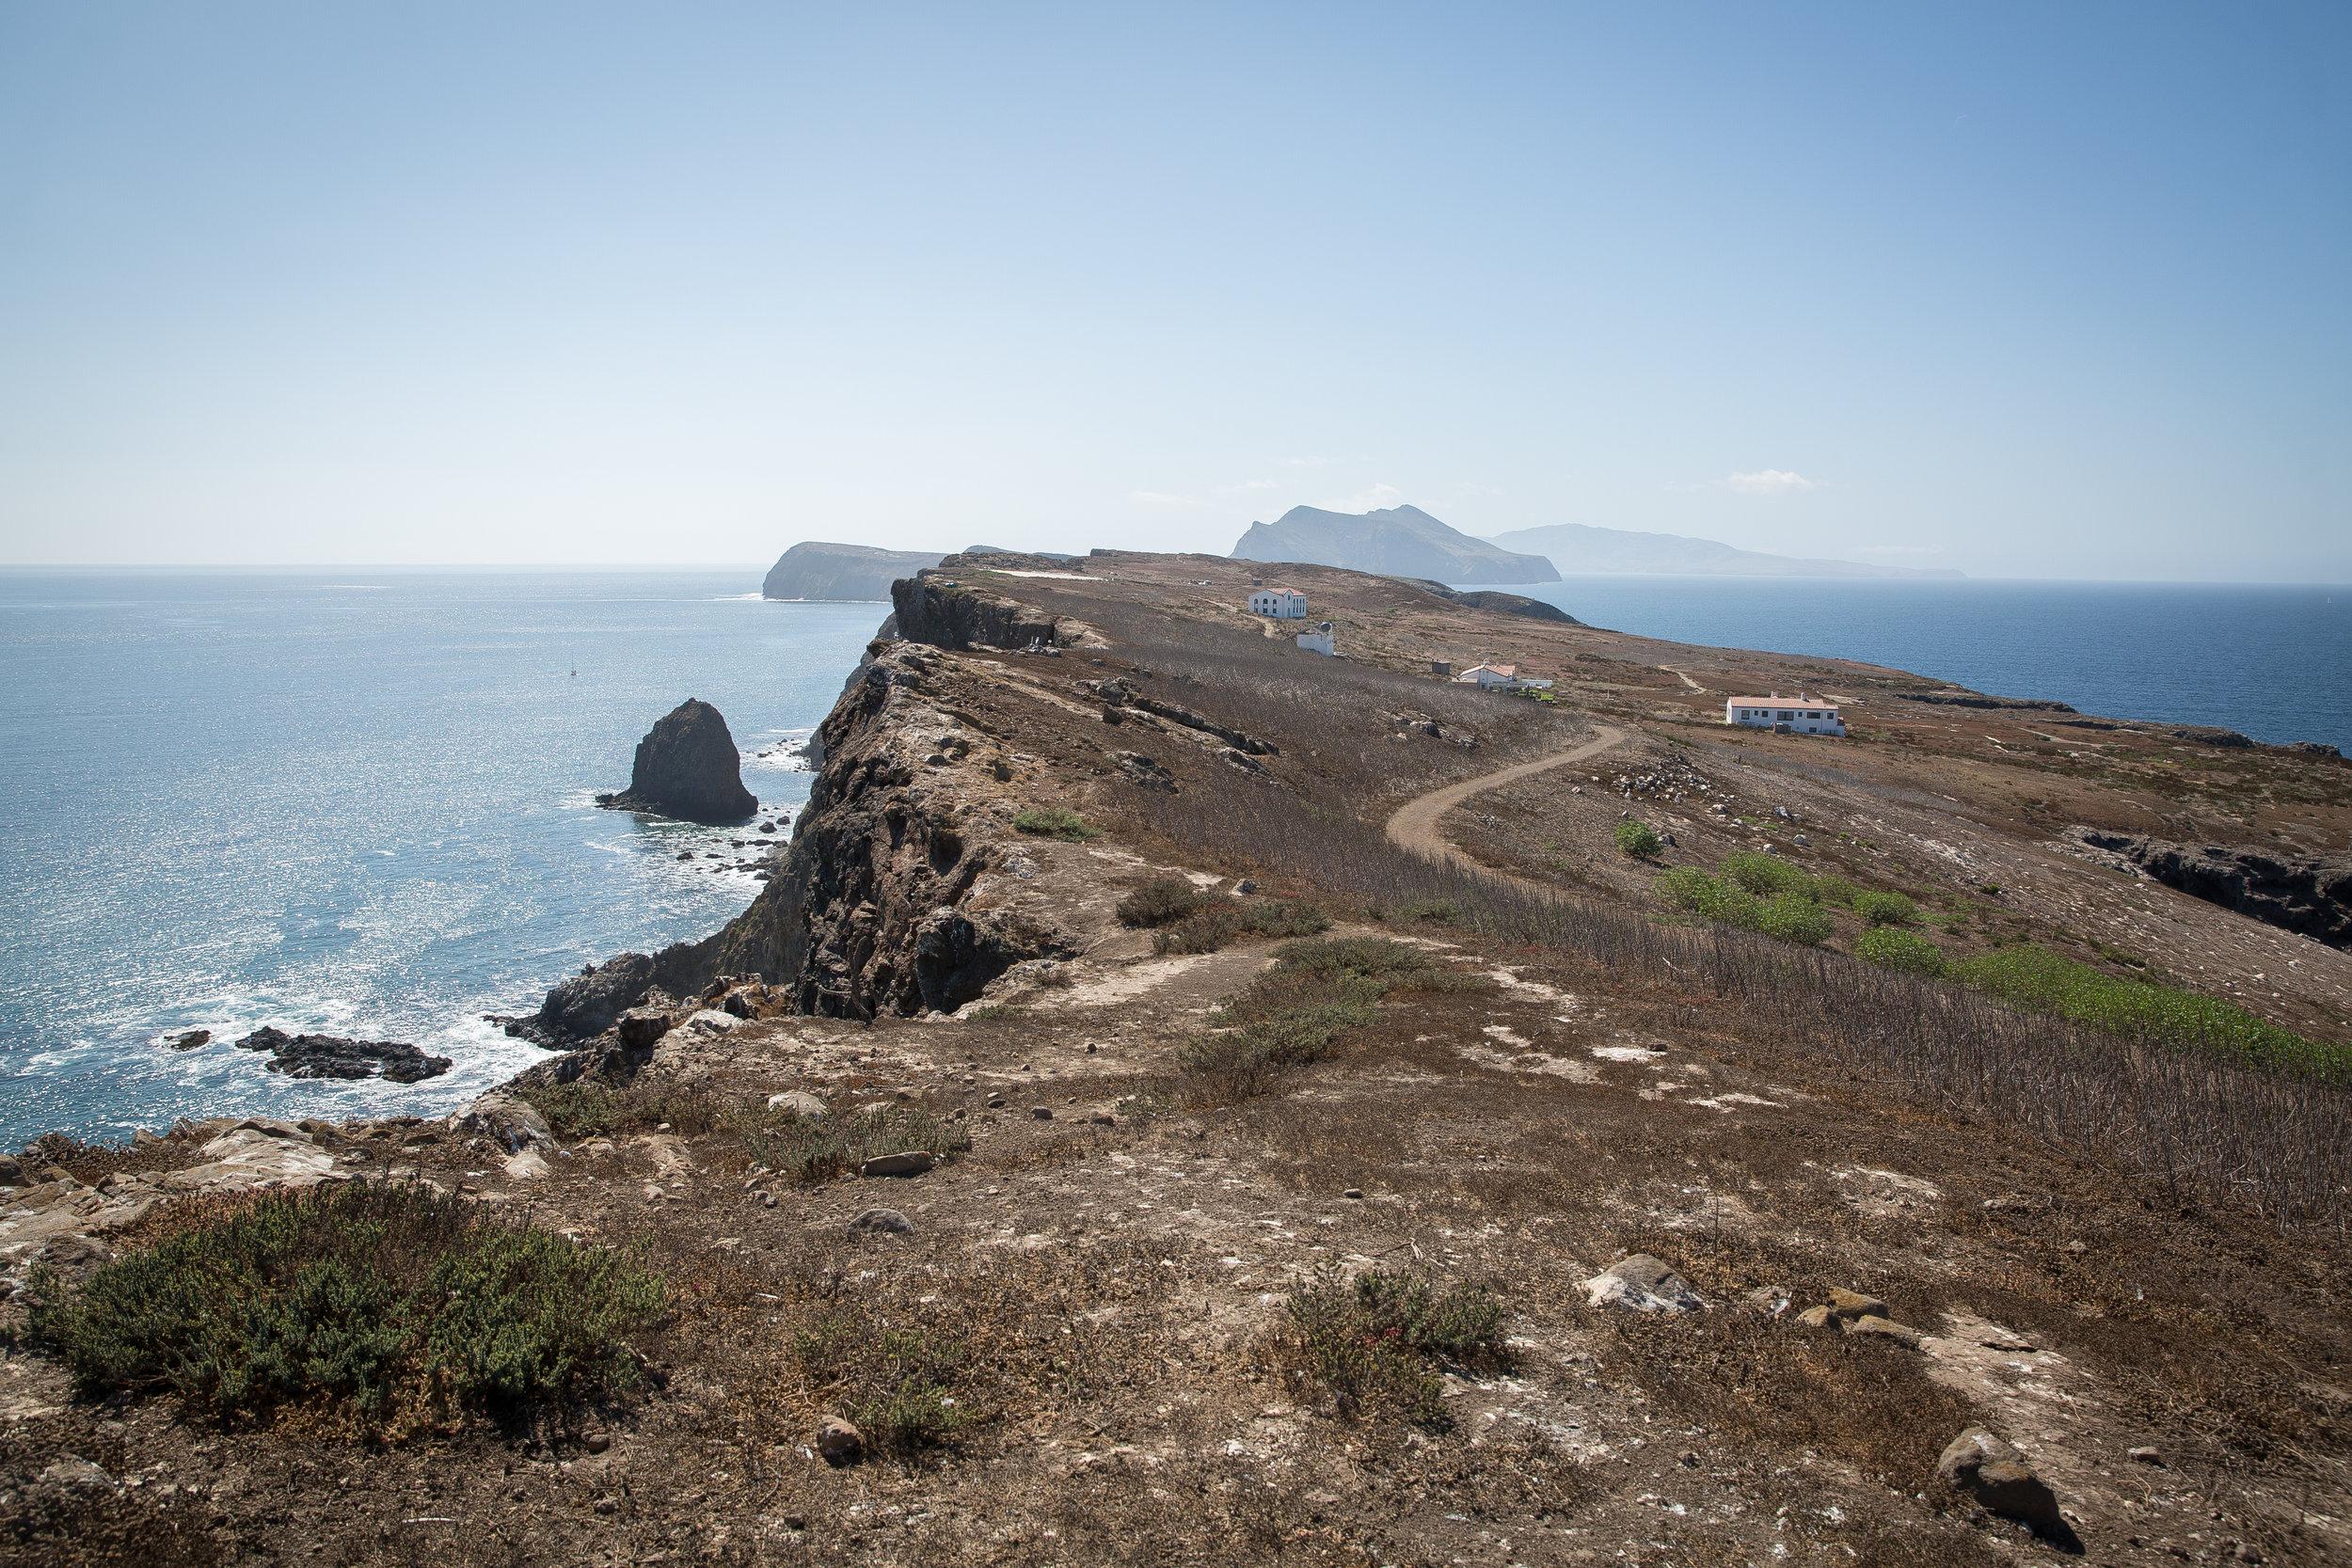 20170915-Anacapa Island REVO-14576.jpg